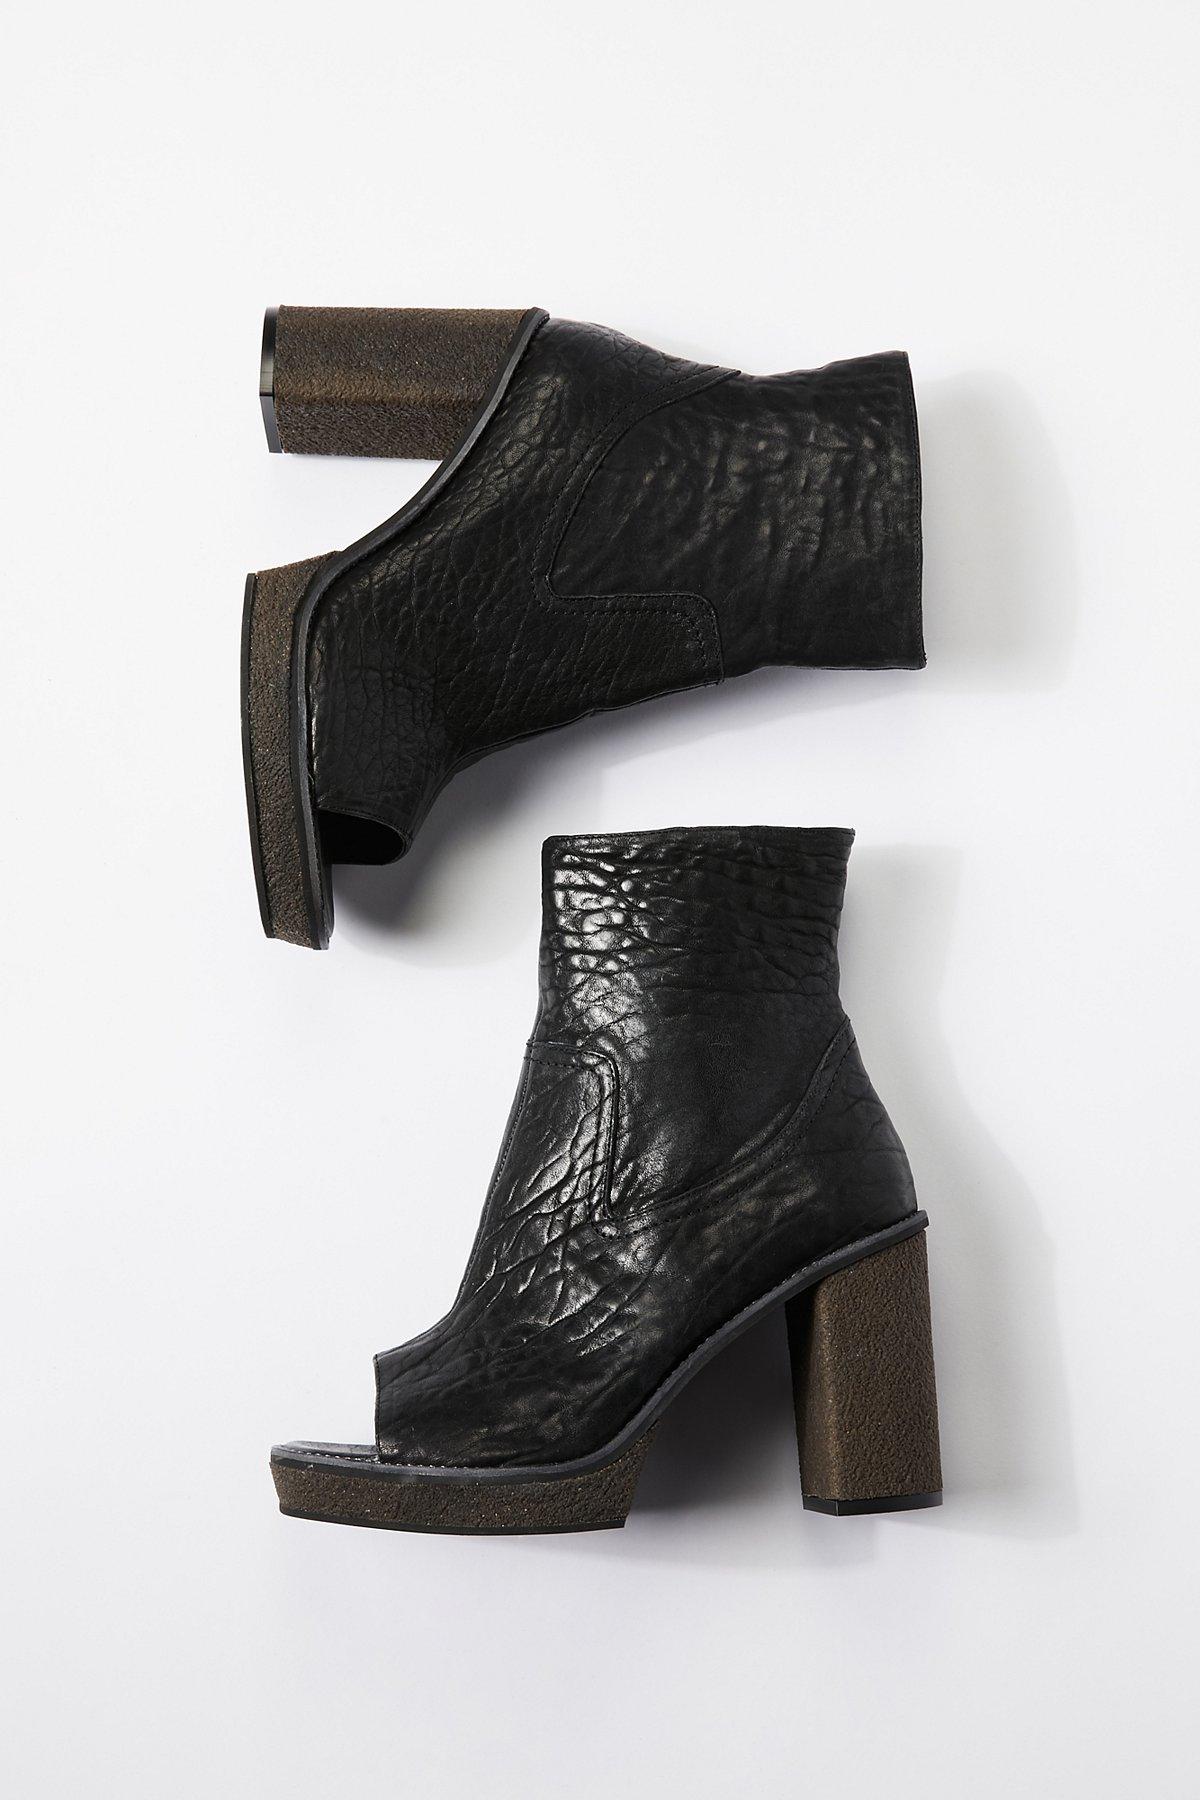 Vance厚底靴